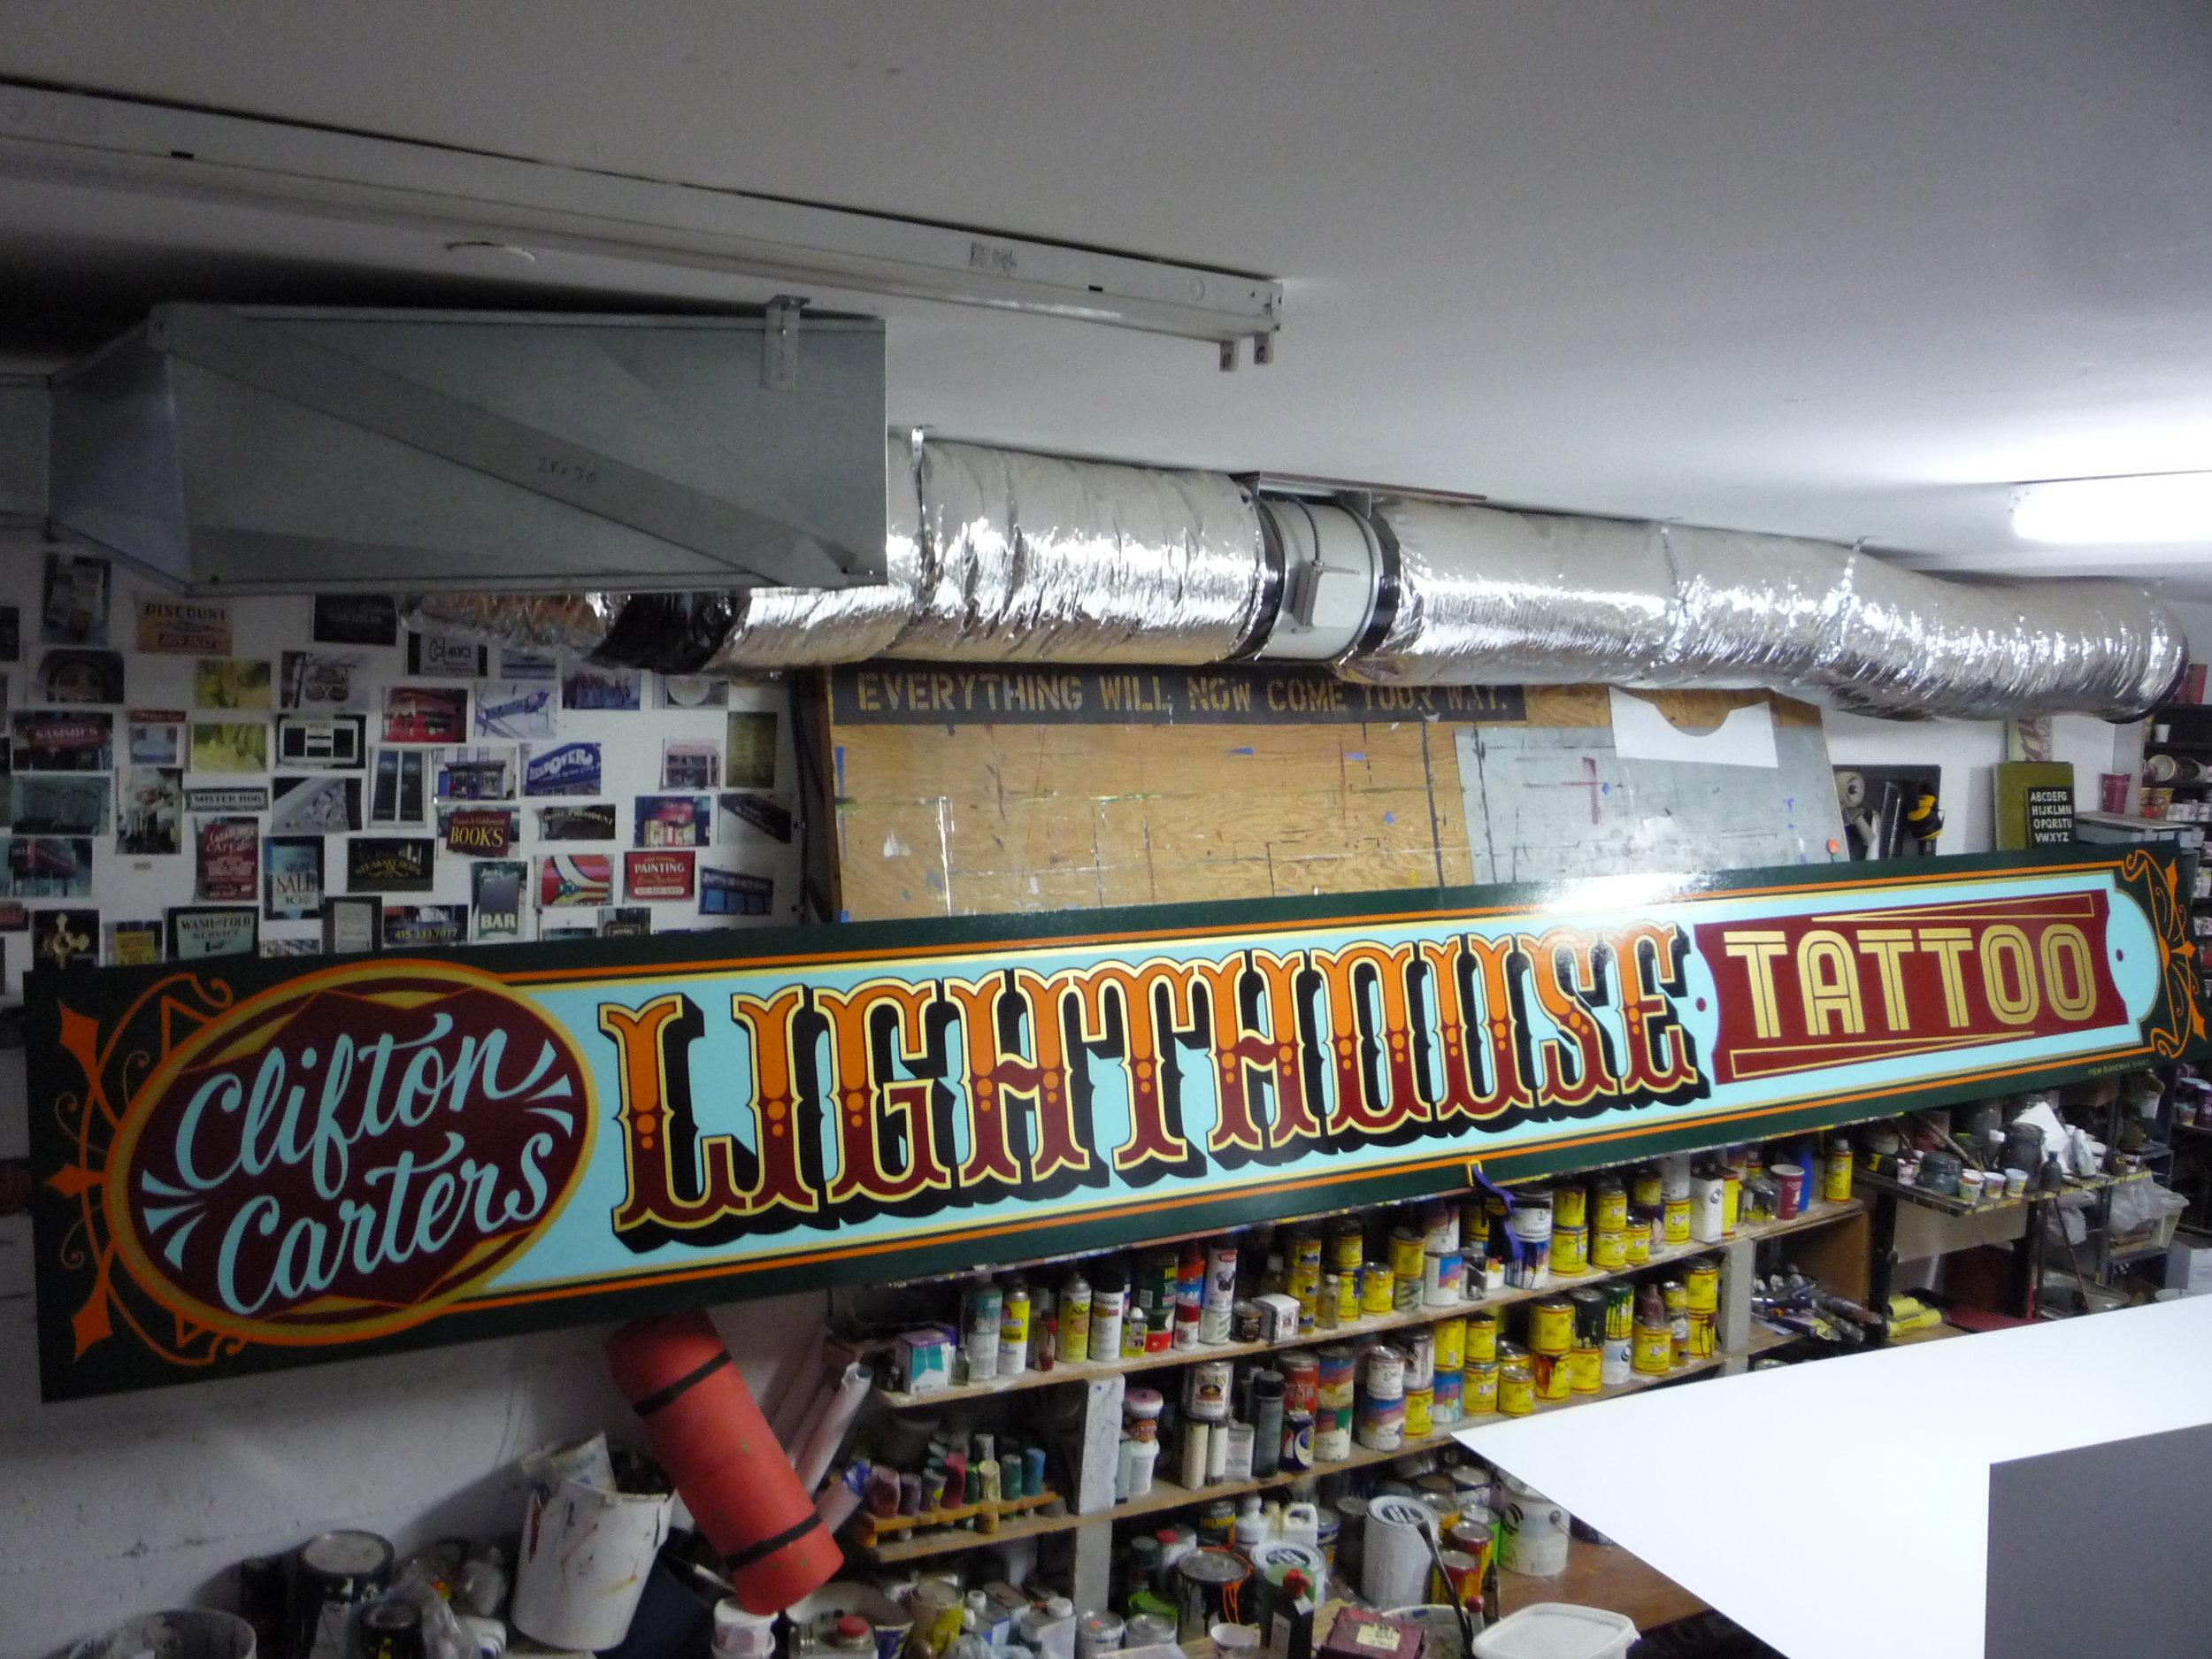 ORIG-clifton-carters-lighthouse-tattoo_4307282058_o.jpg